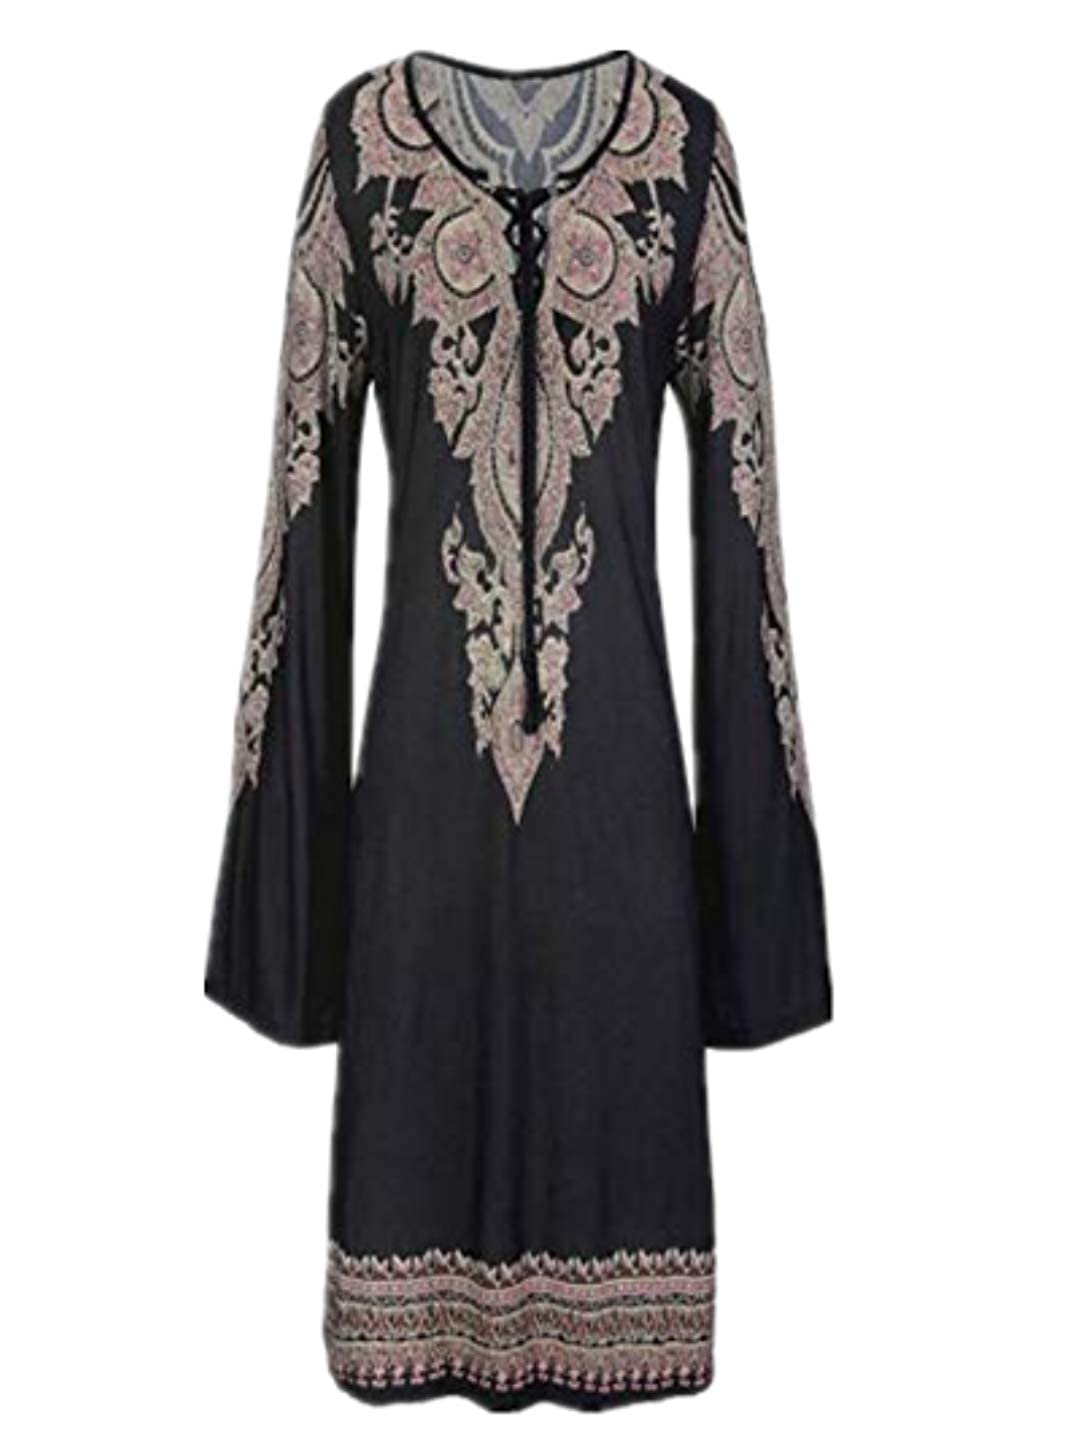 TEBAISE Damen Tunika Strandkleid Minikleid Vintage Bohemian Kleider Strandtunika Frauen Sommerkleid Tunikakleid Bluse